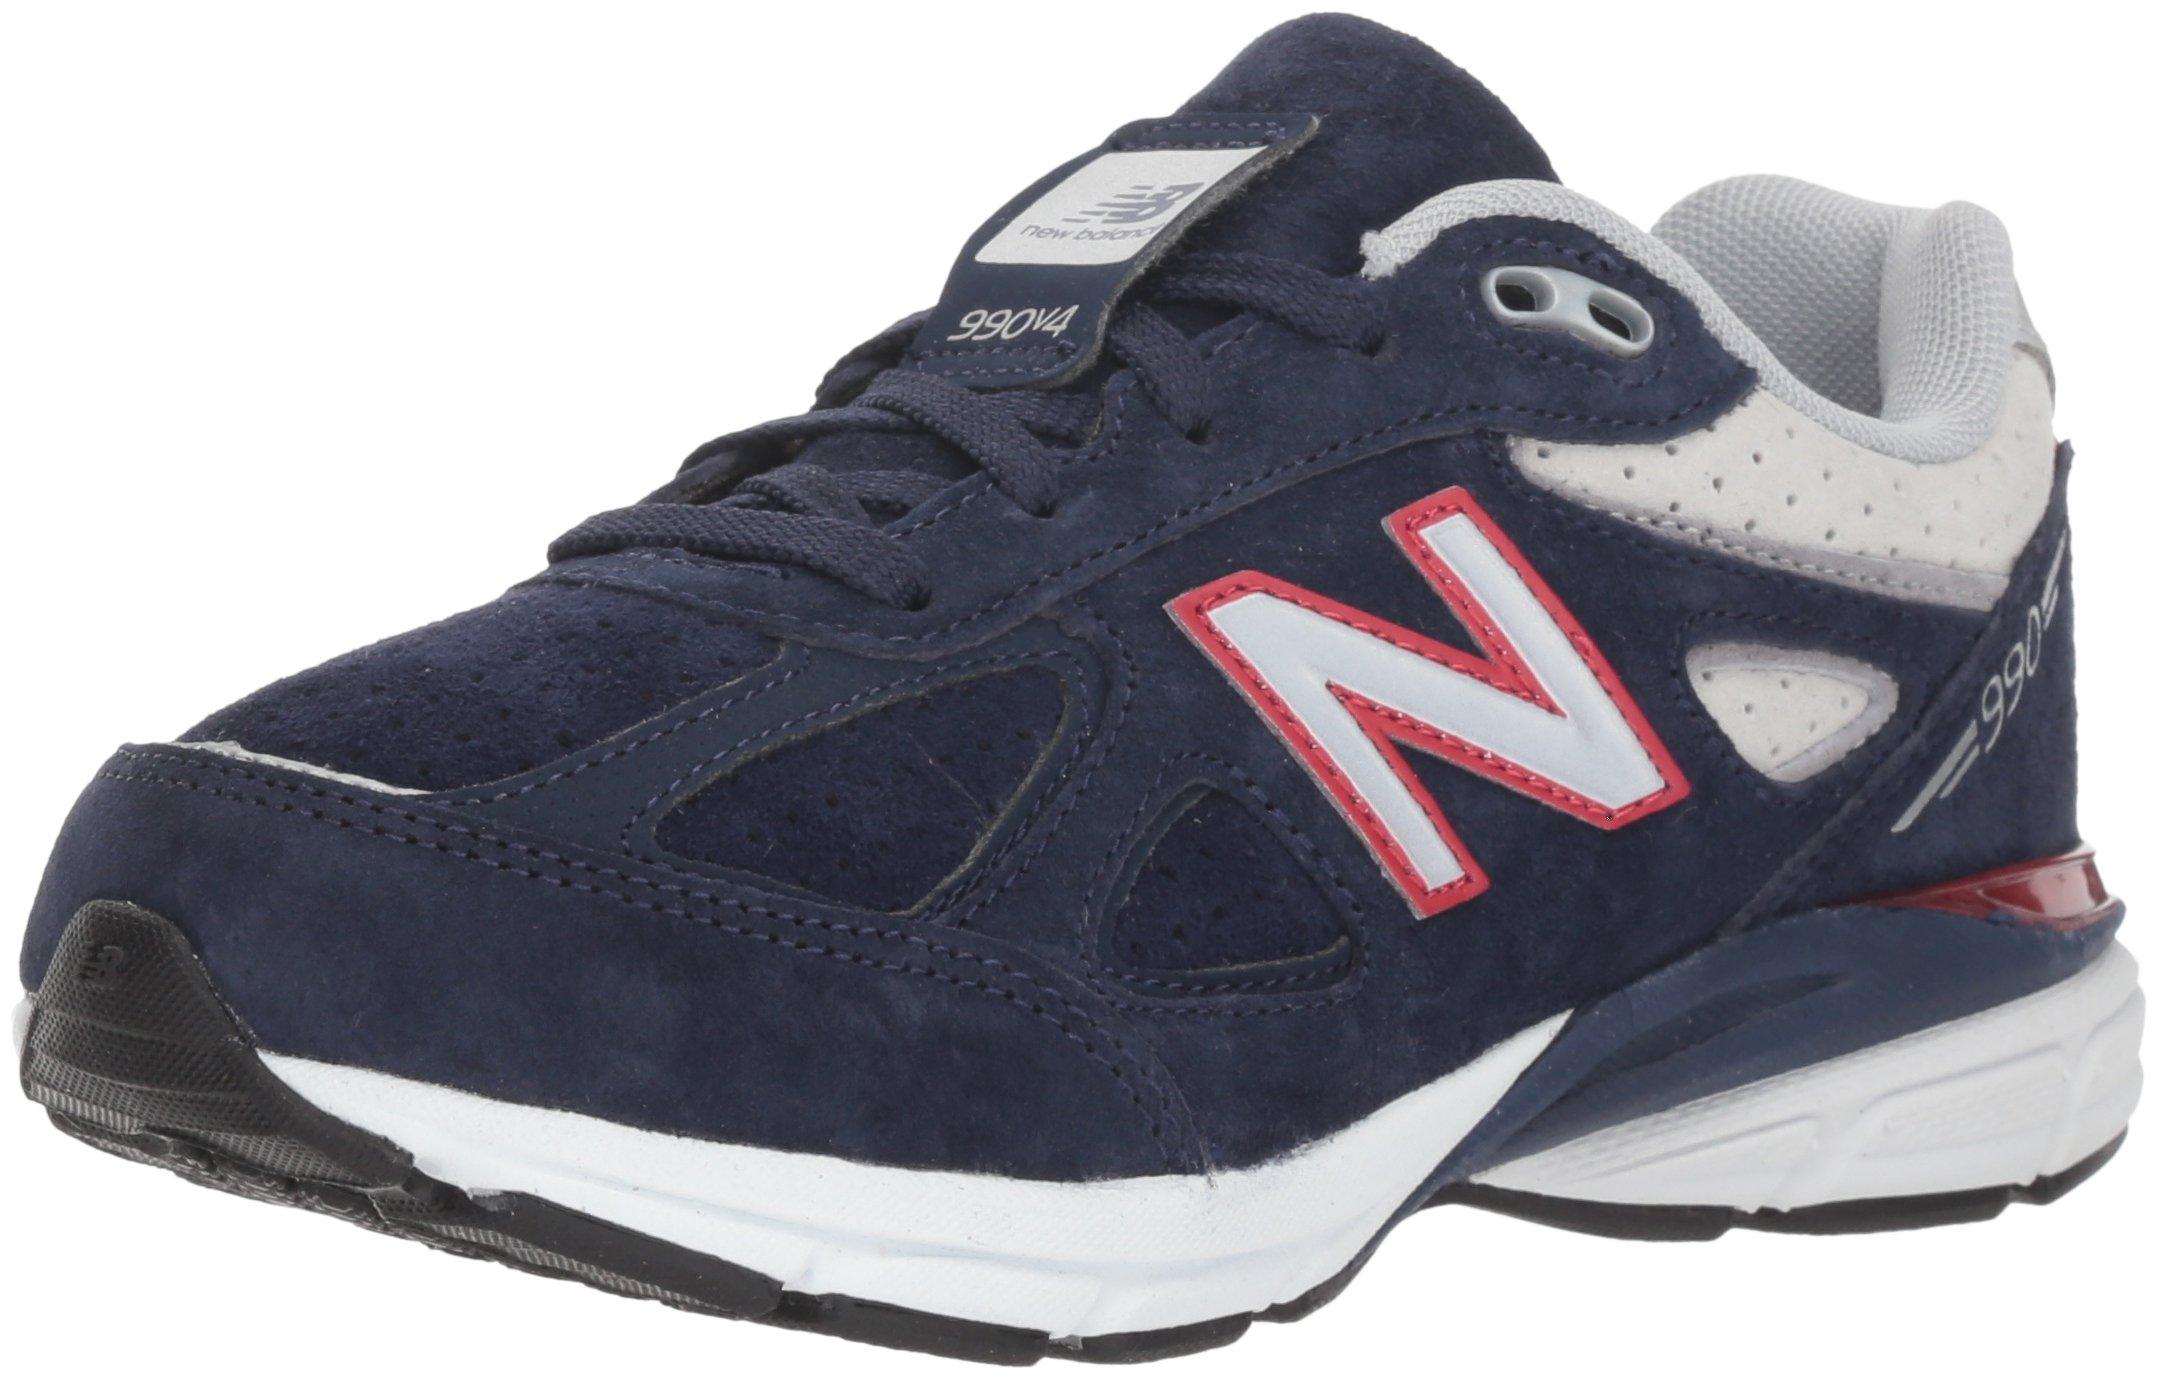 New Balance Boys' 990v4 Sneaker, Blue/Red, 6.5 M US Big Kid